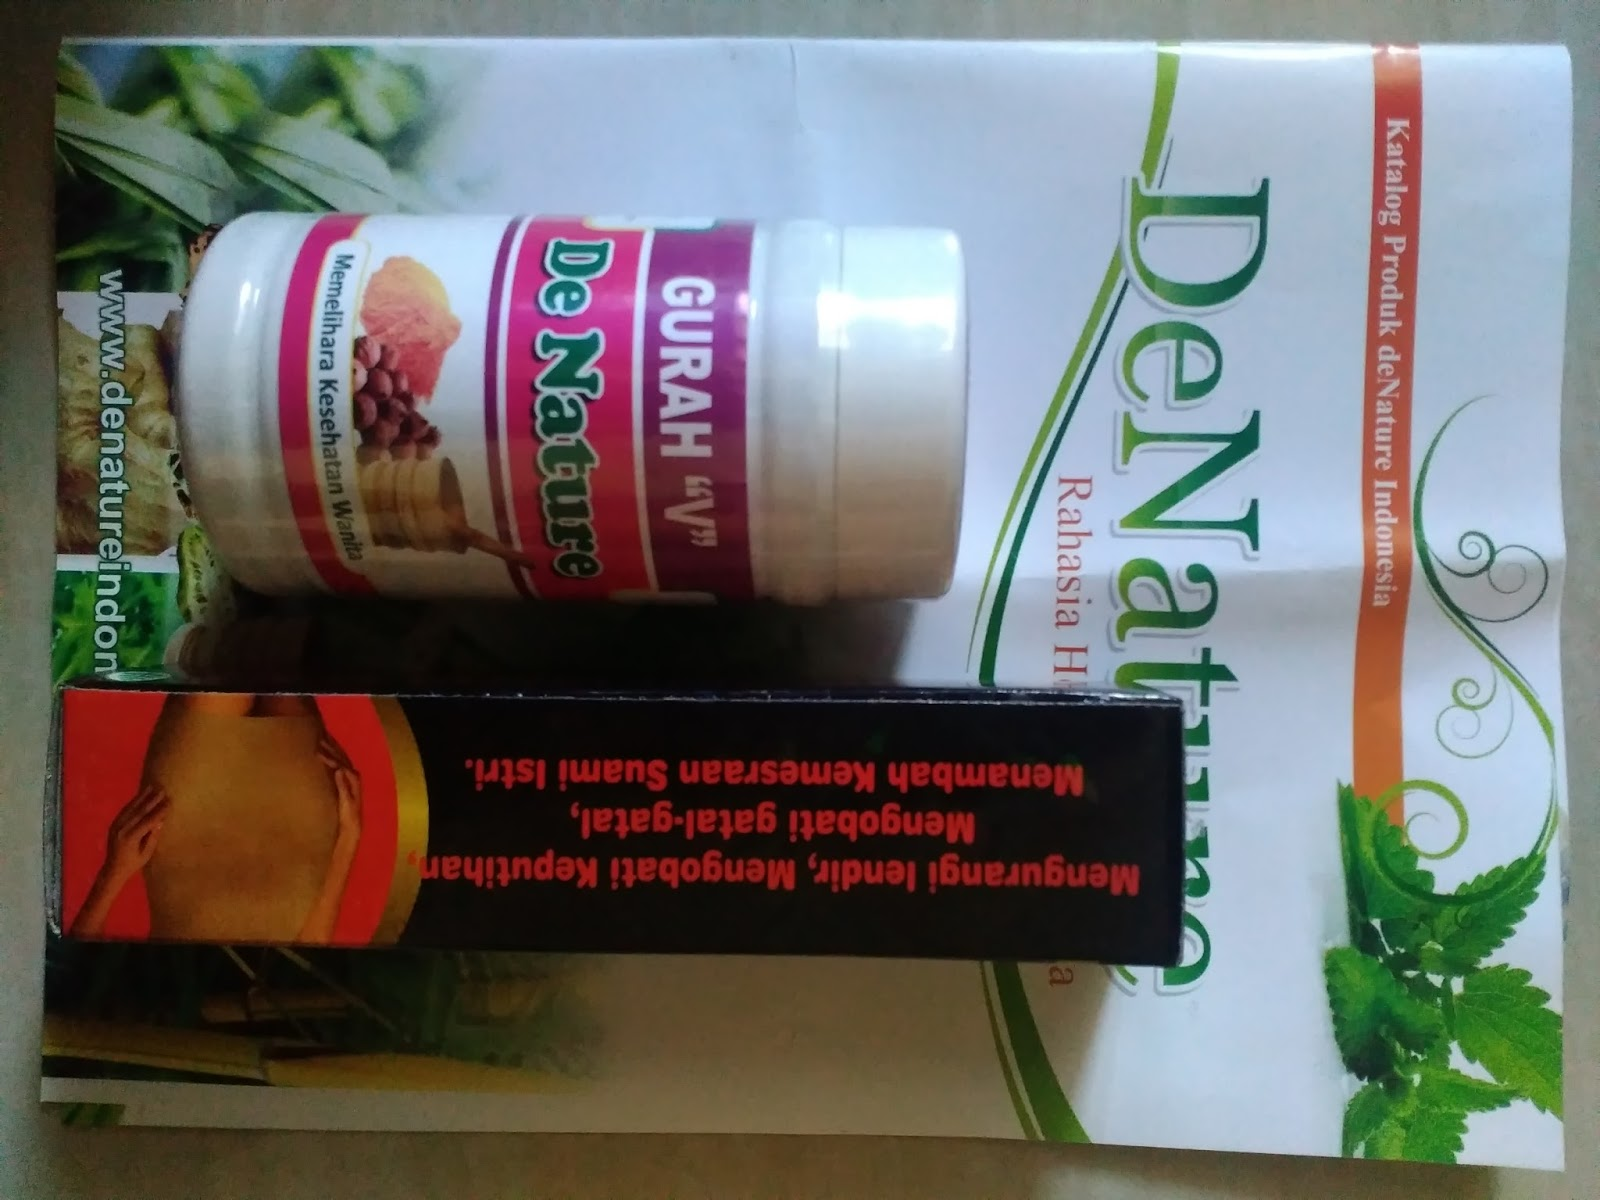 obat keputihan dan bau tidak sedap